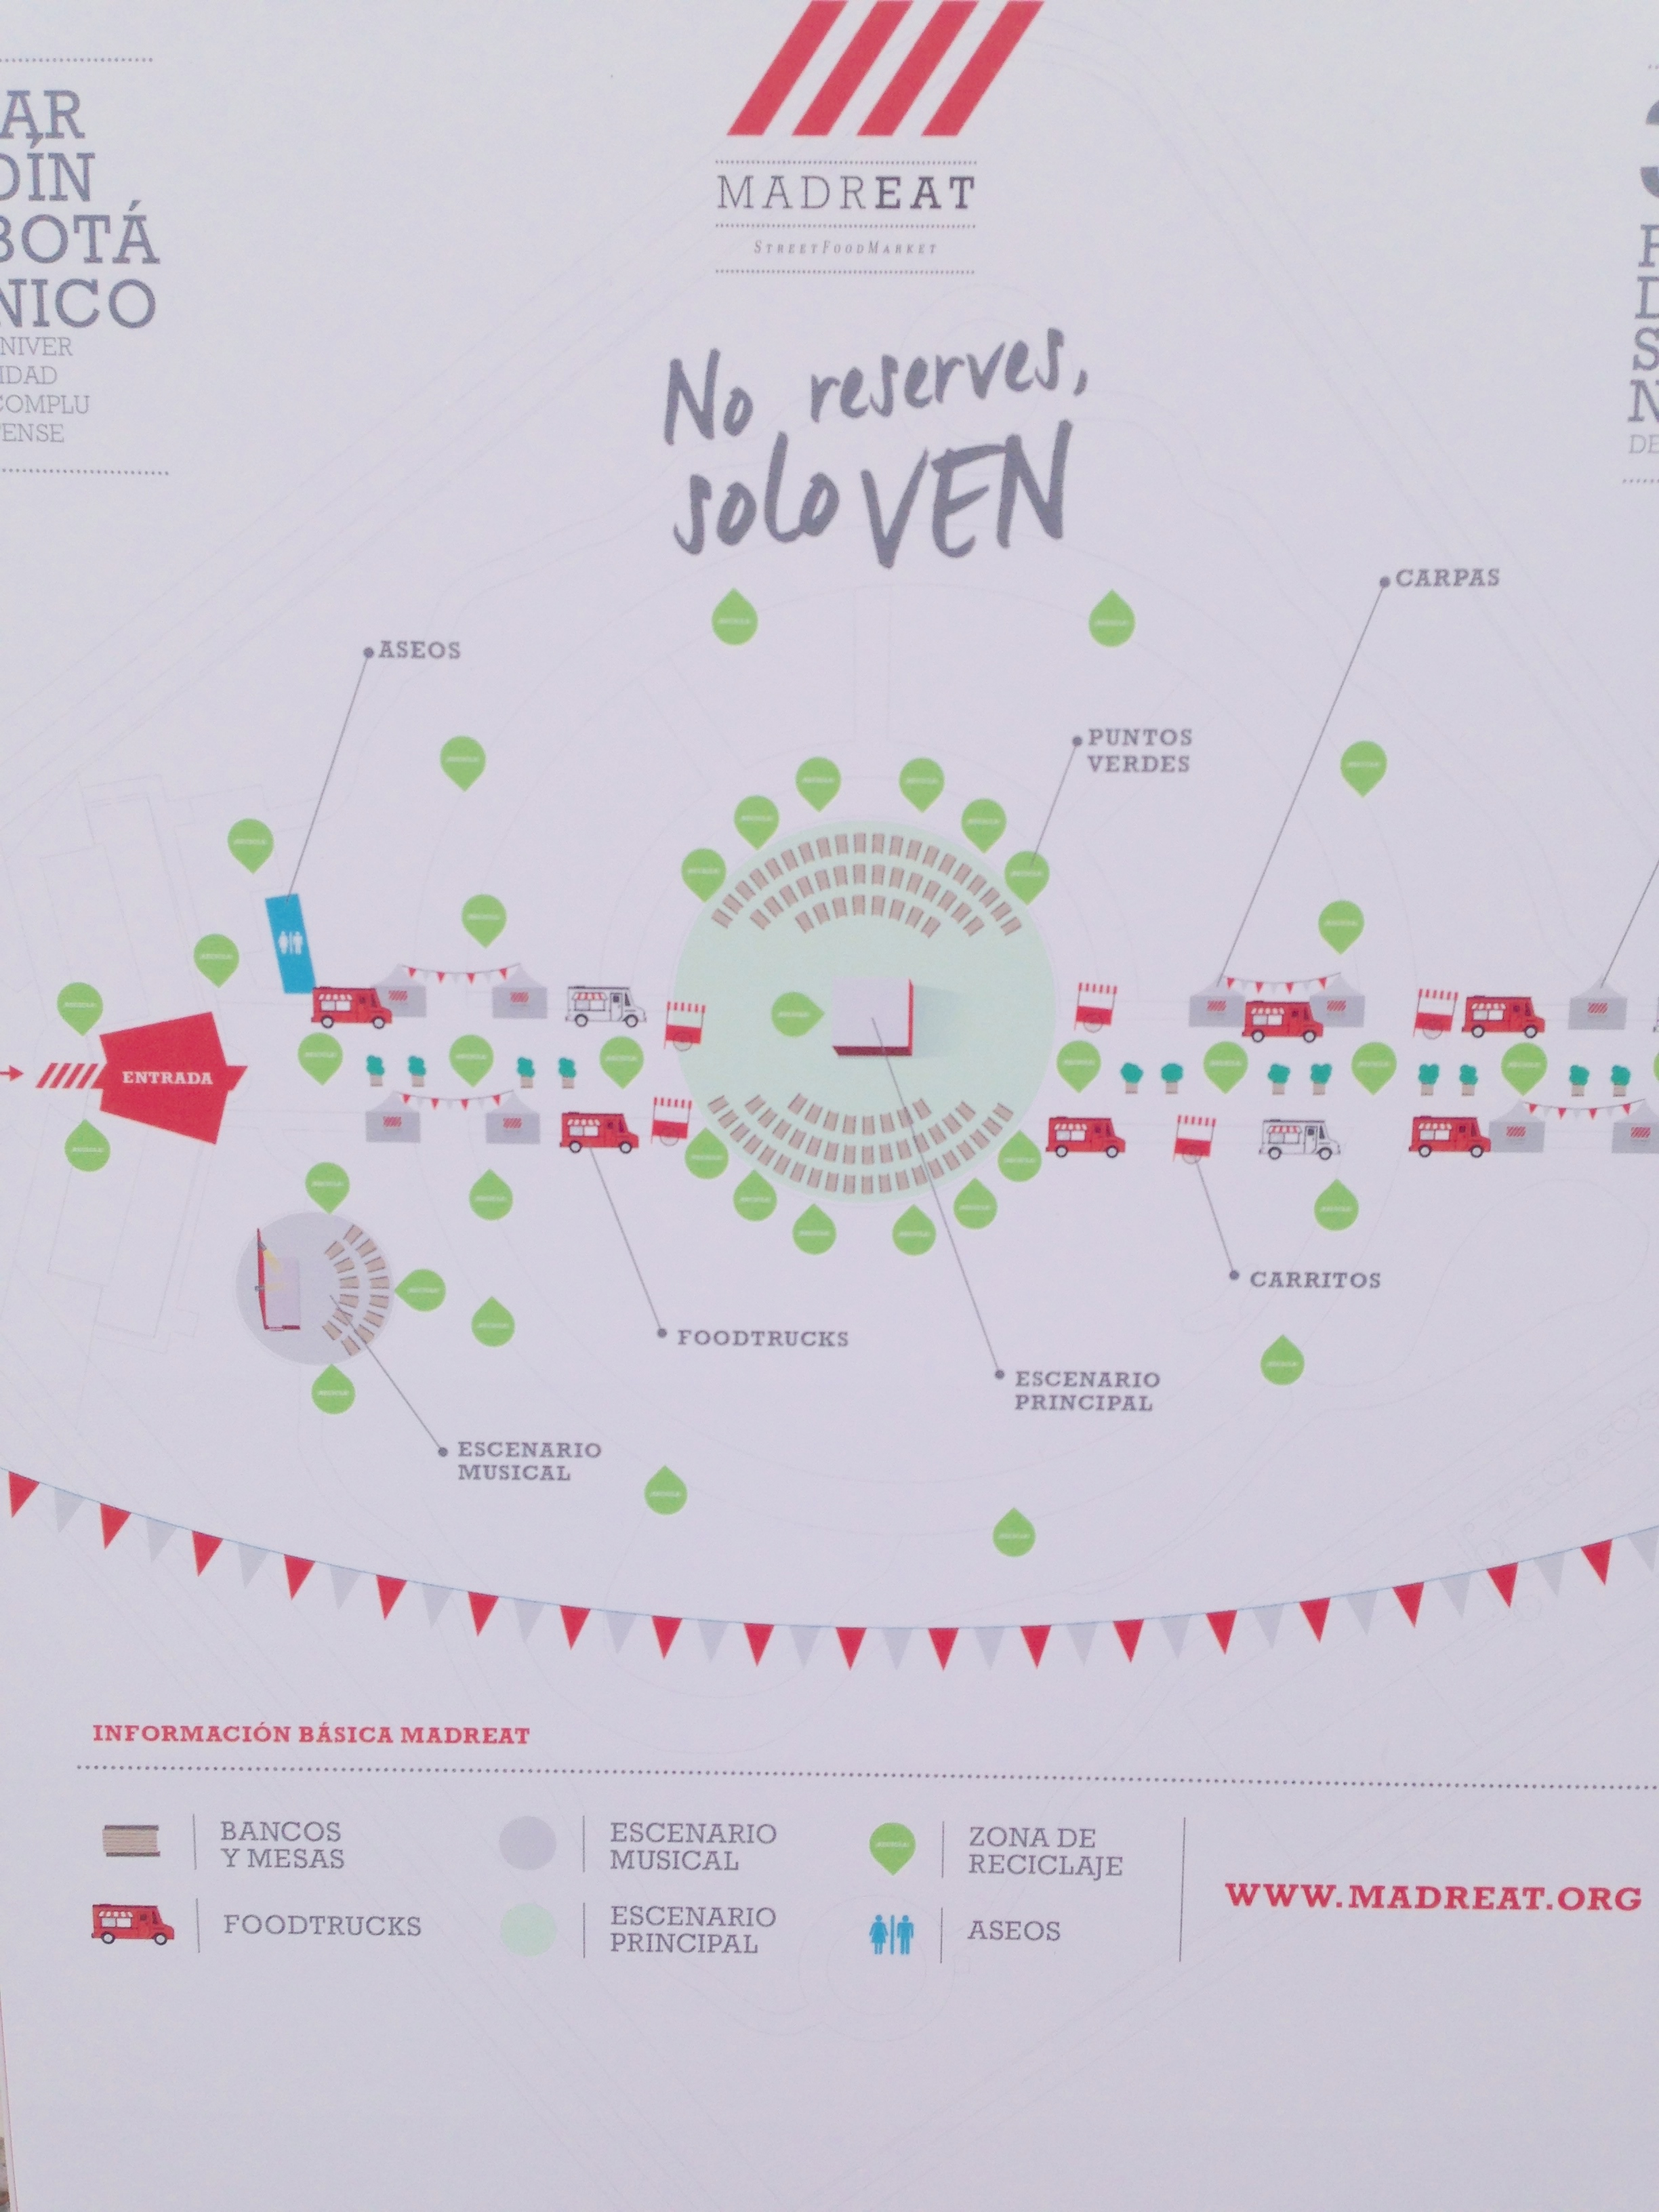 treintamasdiez-blog-de-moda mapa